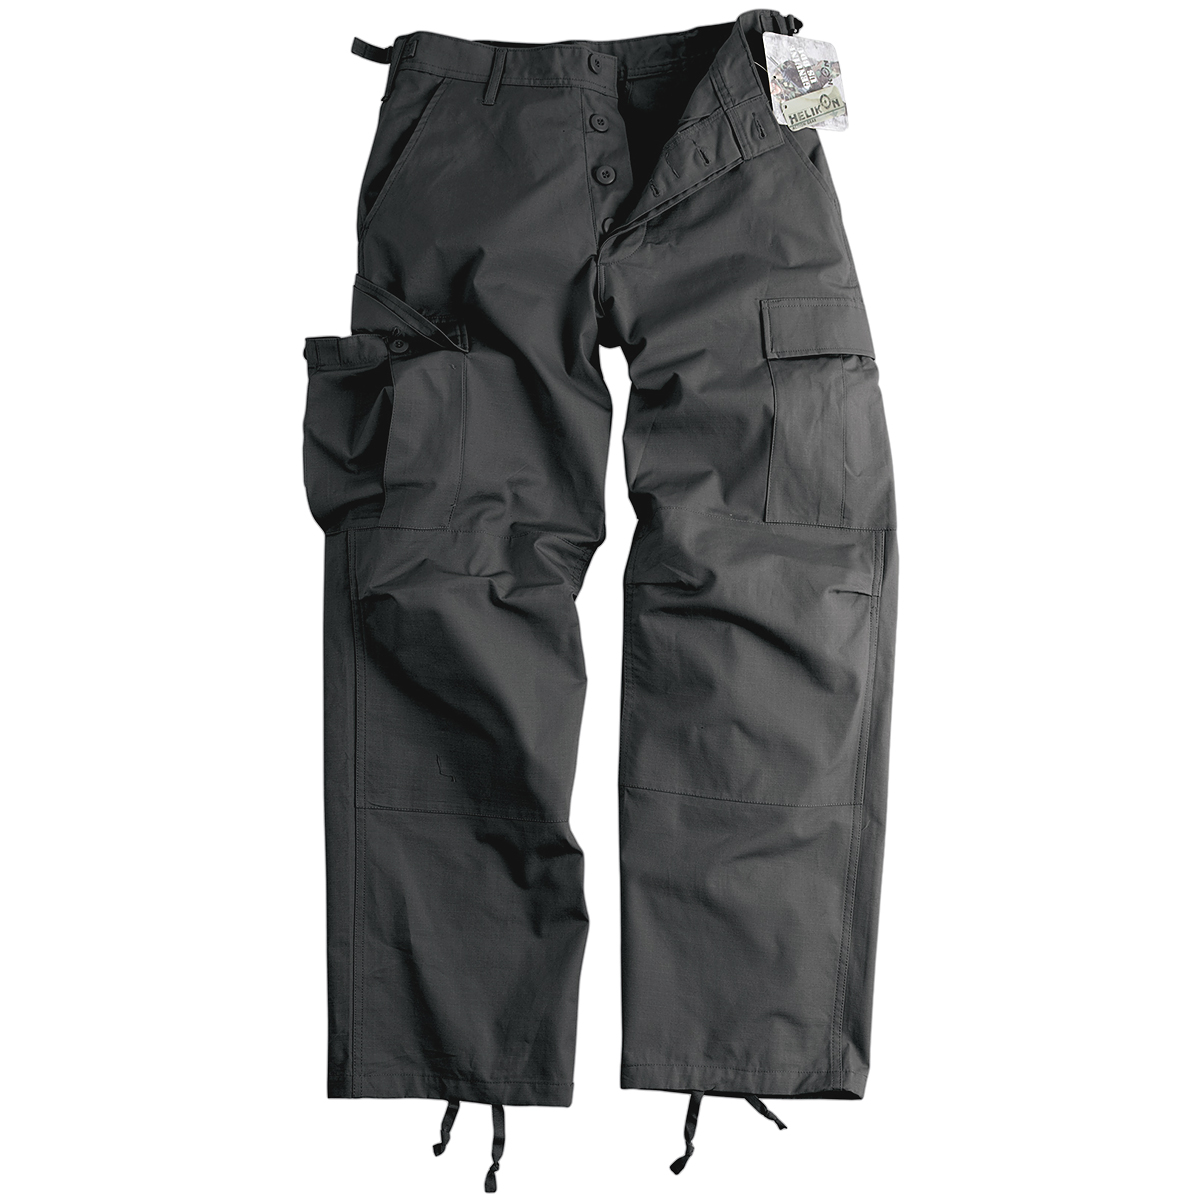 black tactical cargo pants - photo #27